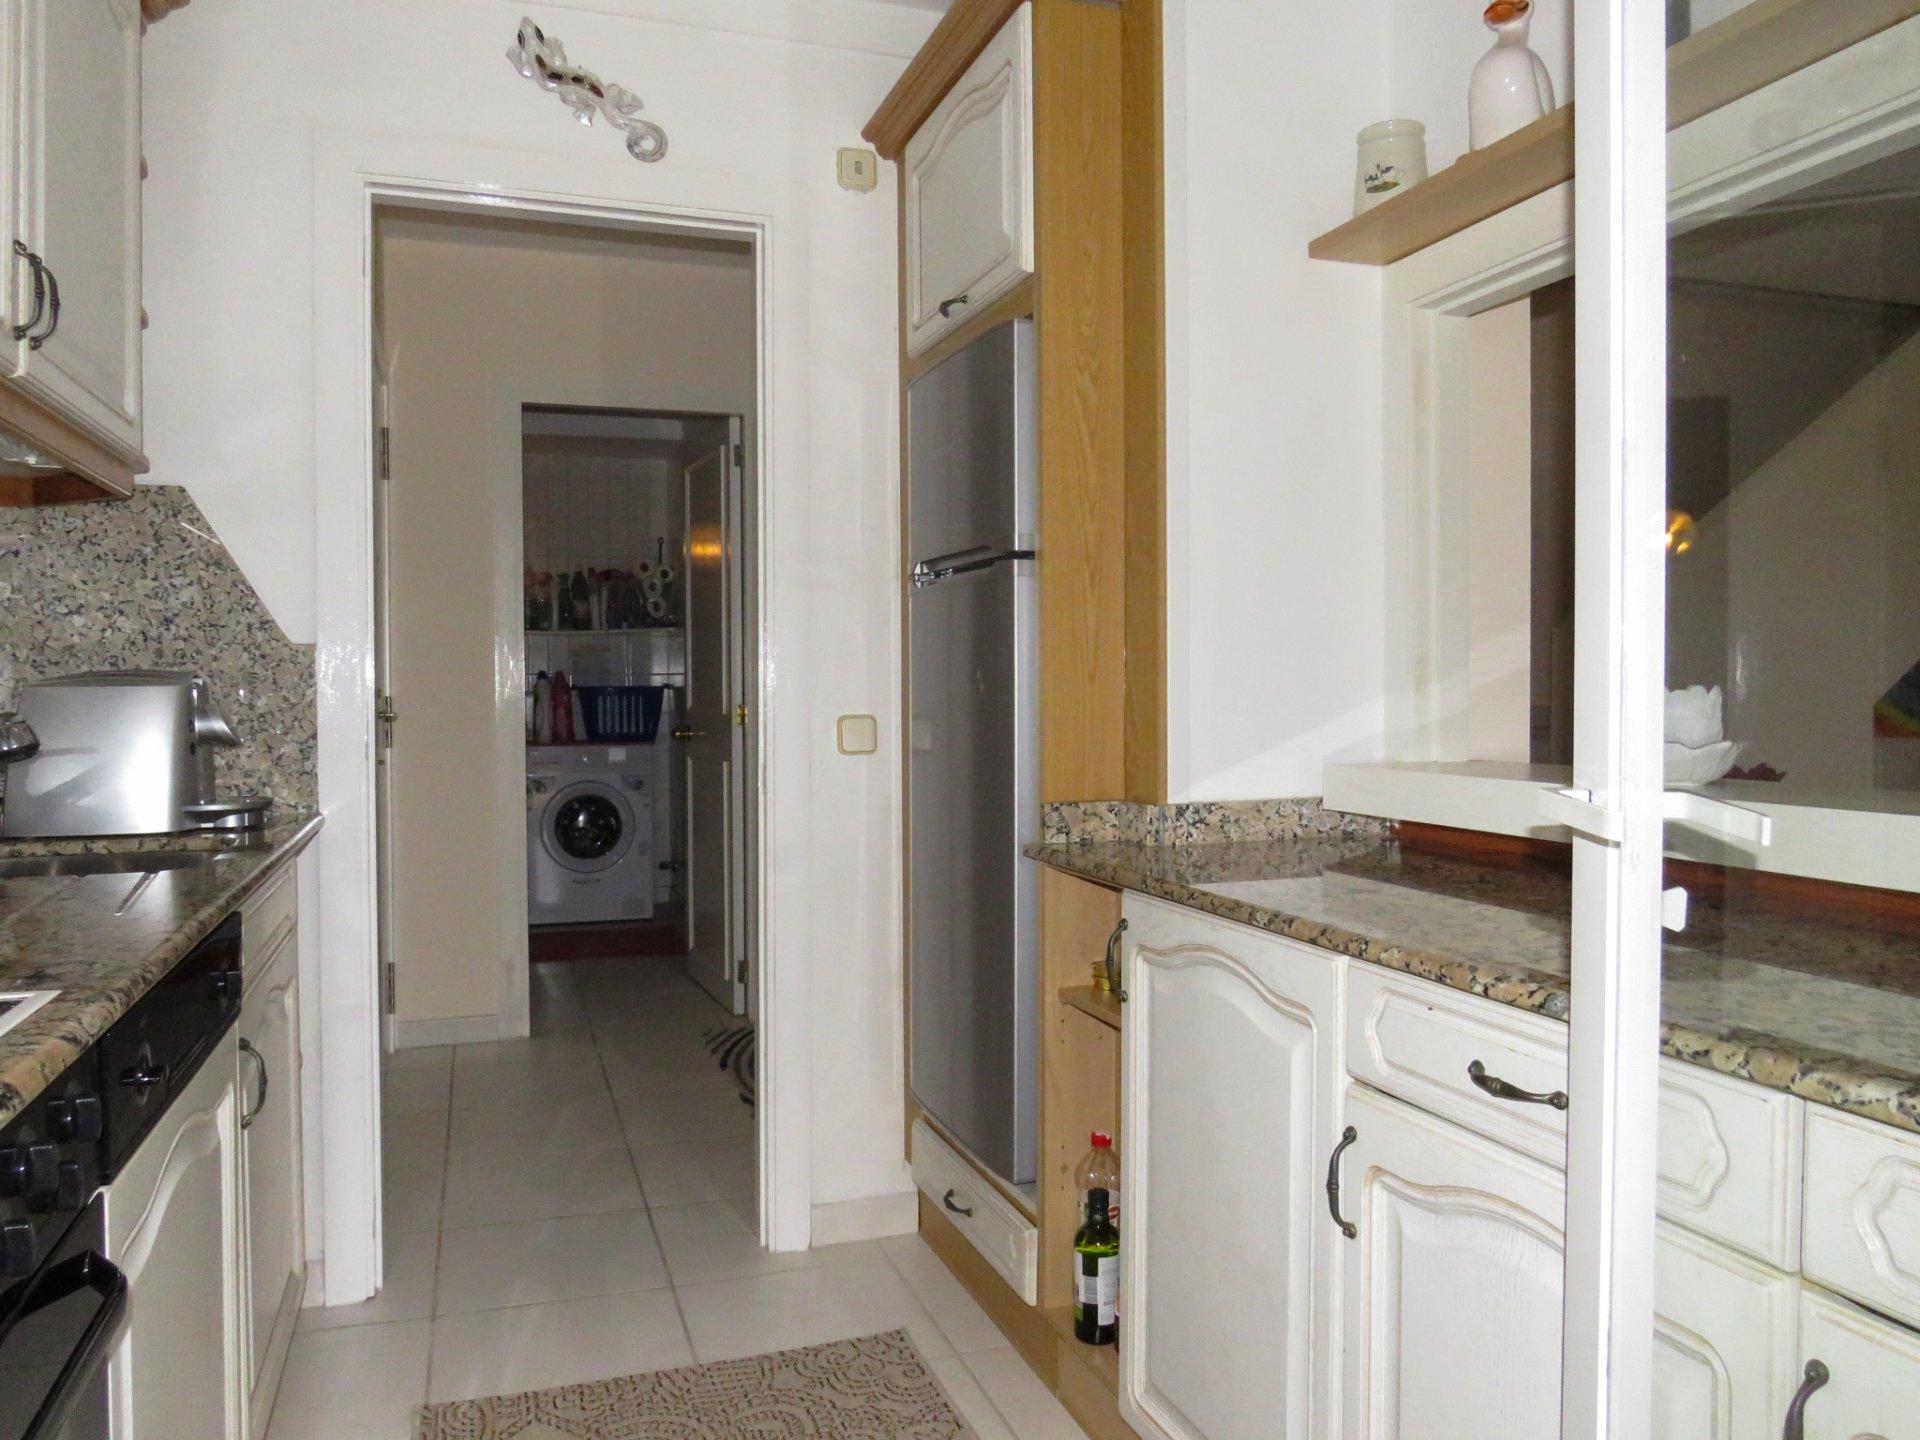 Ad Sale Apartment Santa Ponsa (07180), 4 Rooms ref:V0372SP